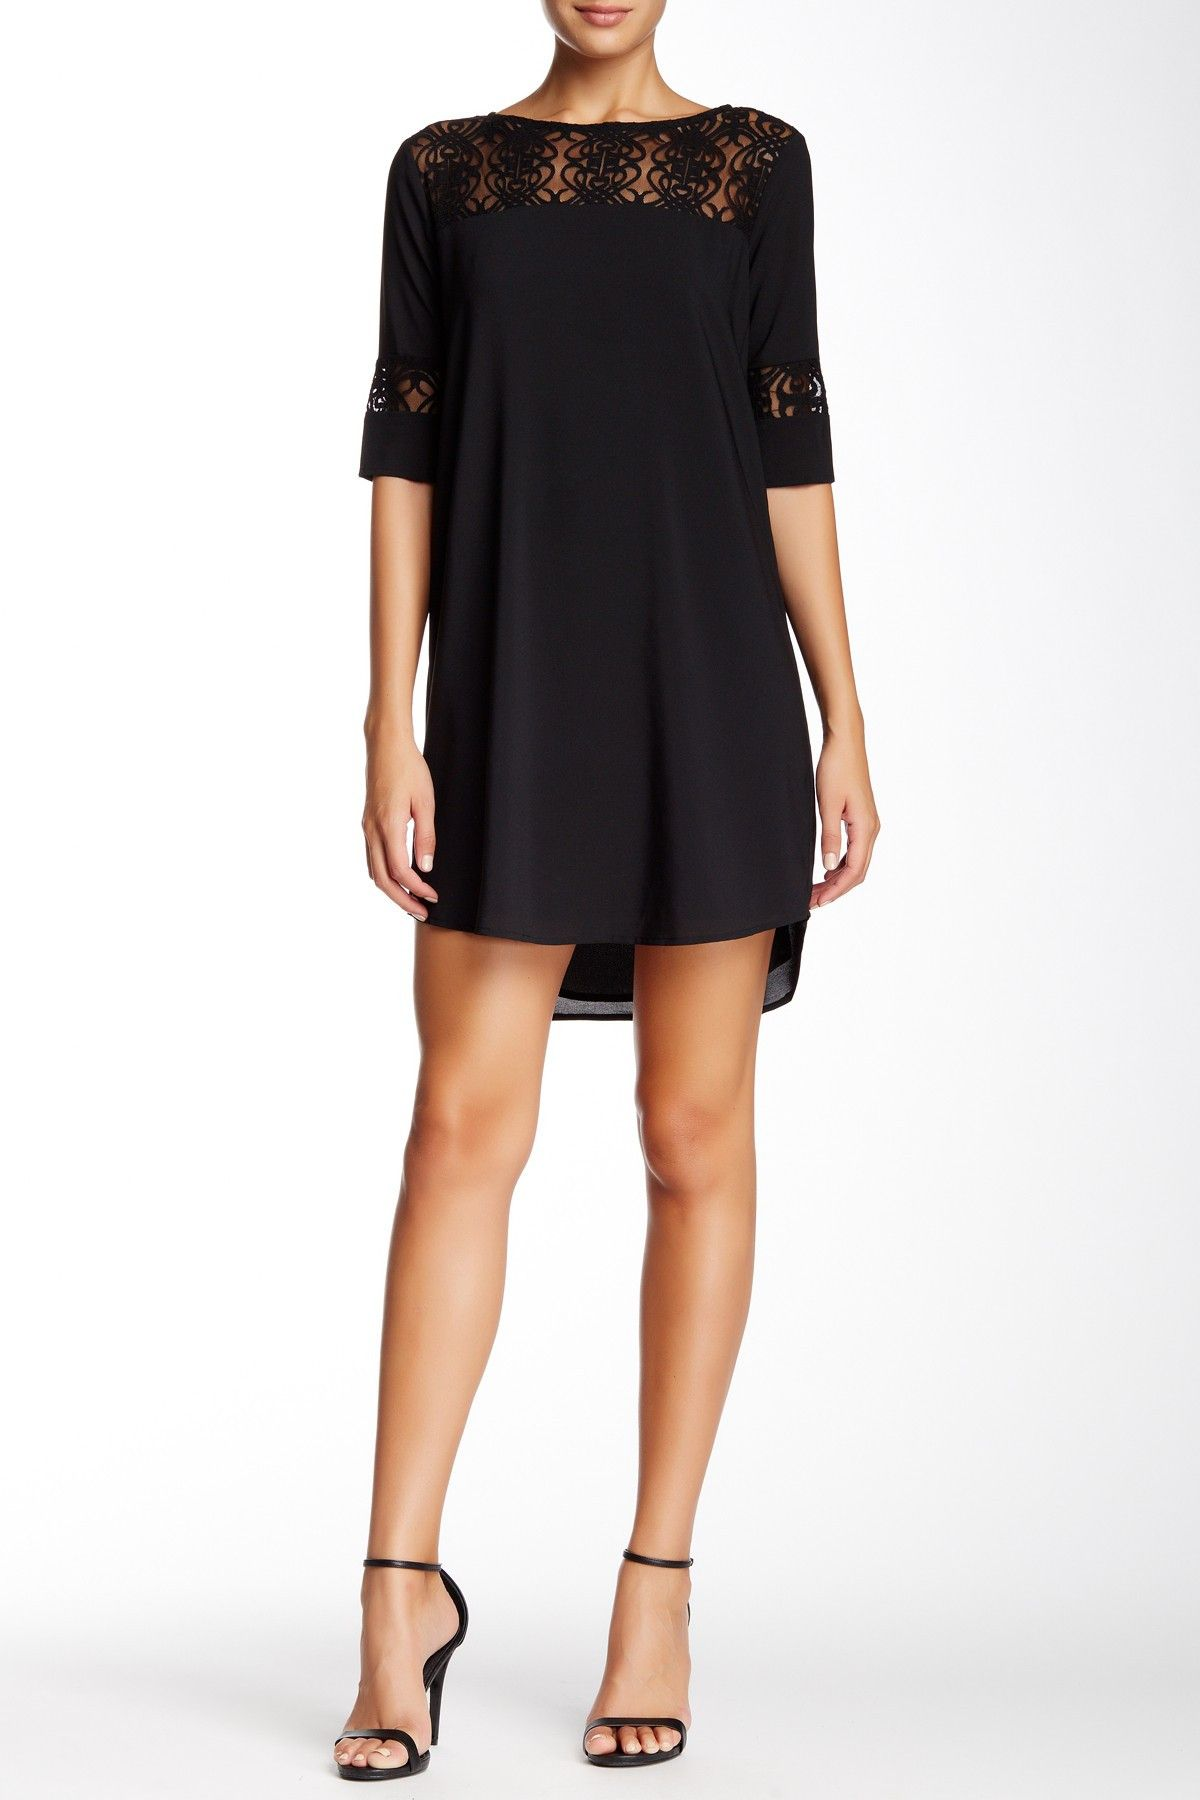 BB Dakota | Lace Trim Shift Dress | Nordstrom Rack